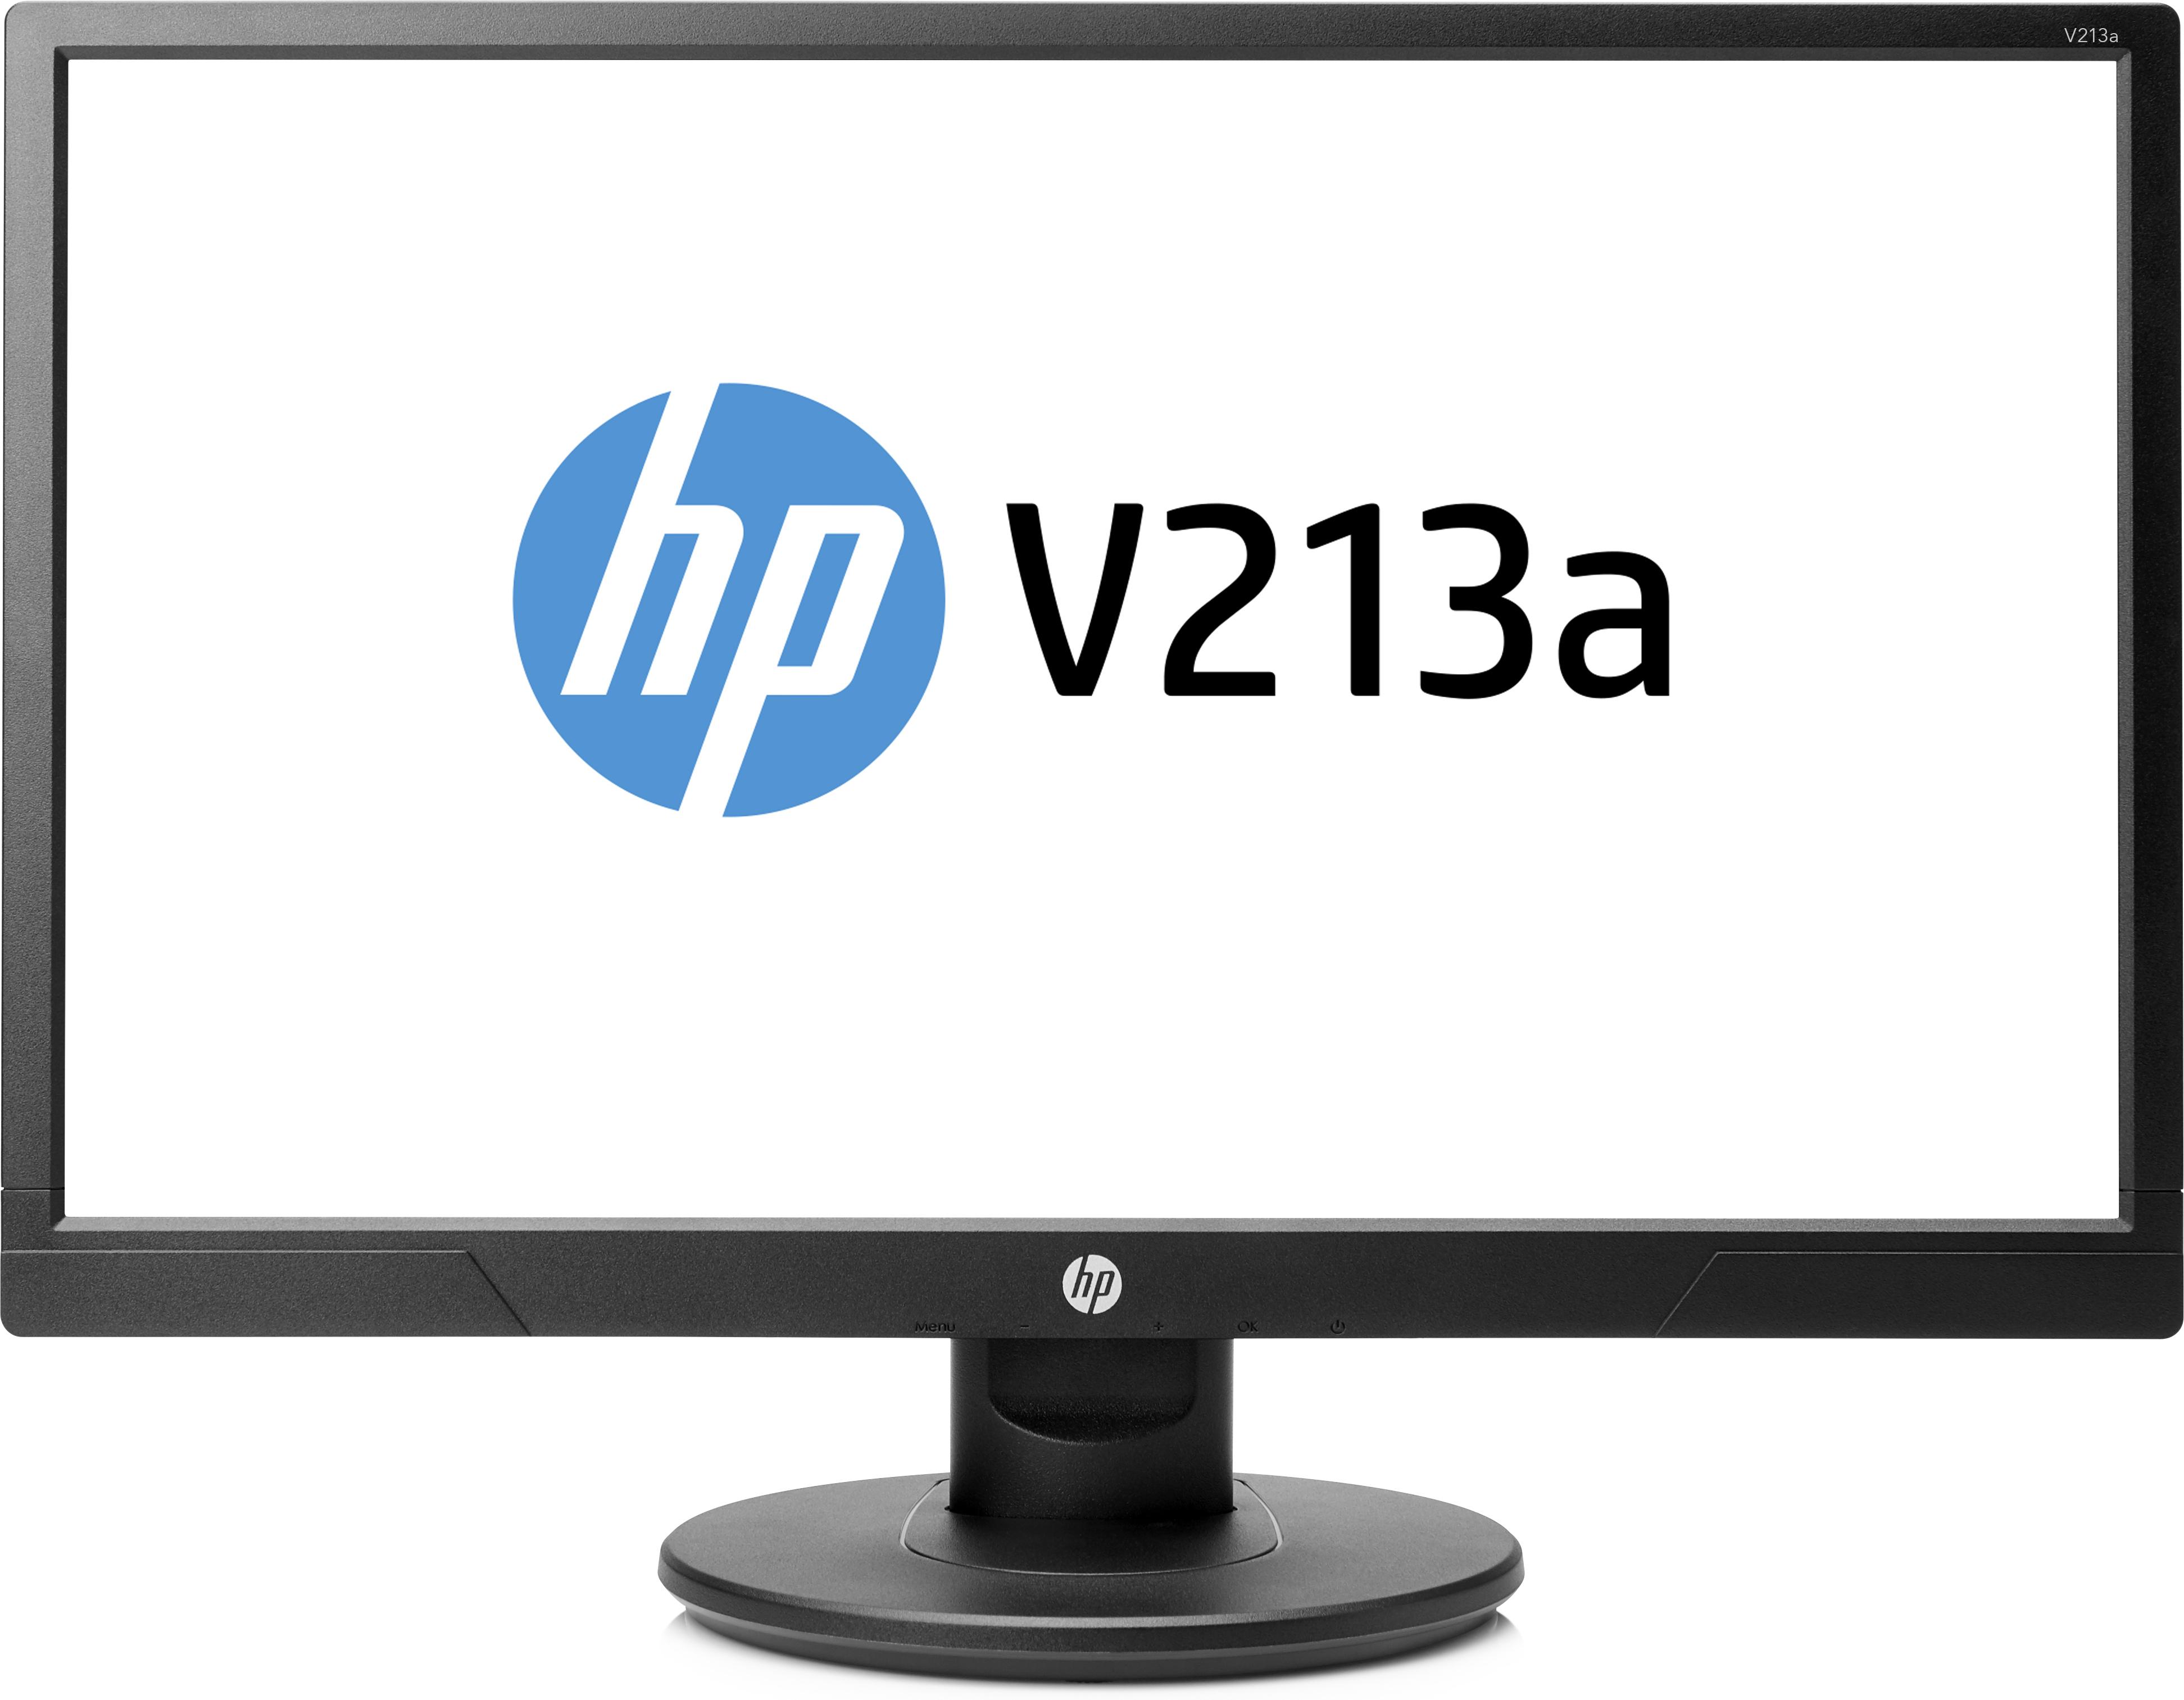 8472-featured-32583733-HP.jpg